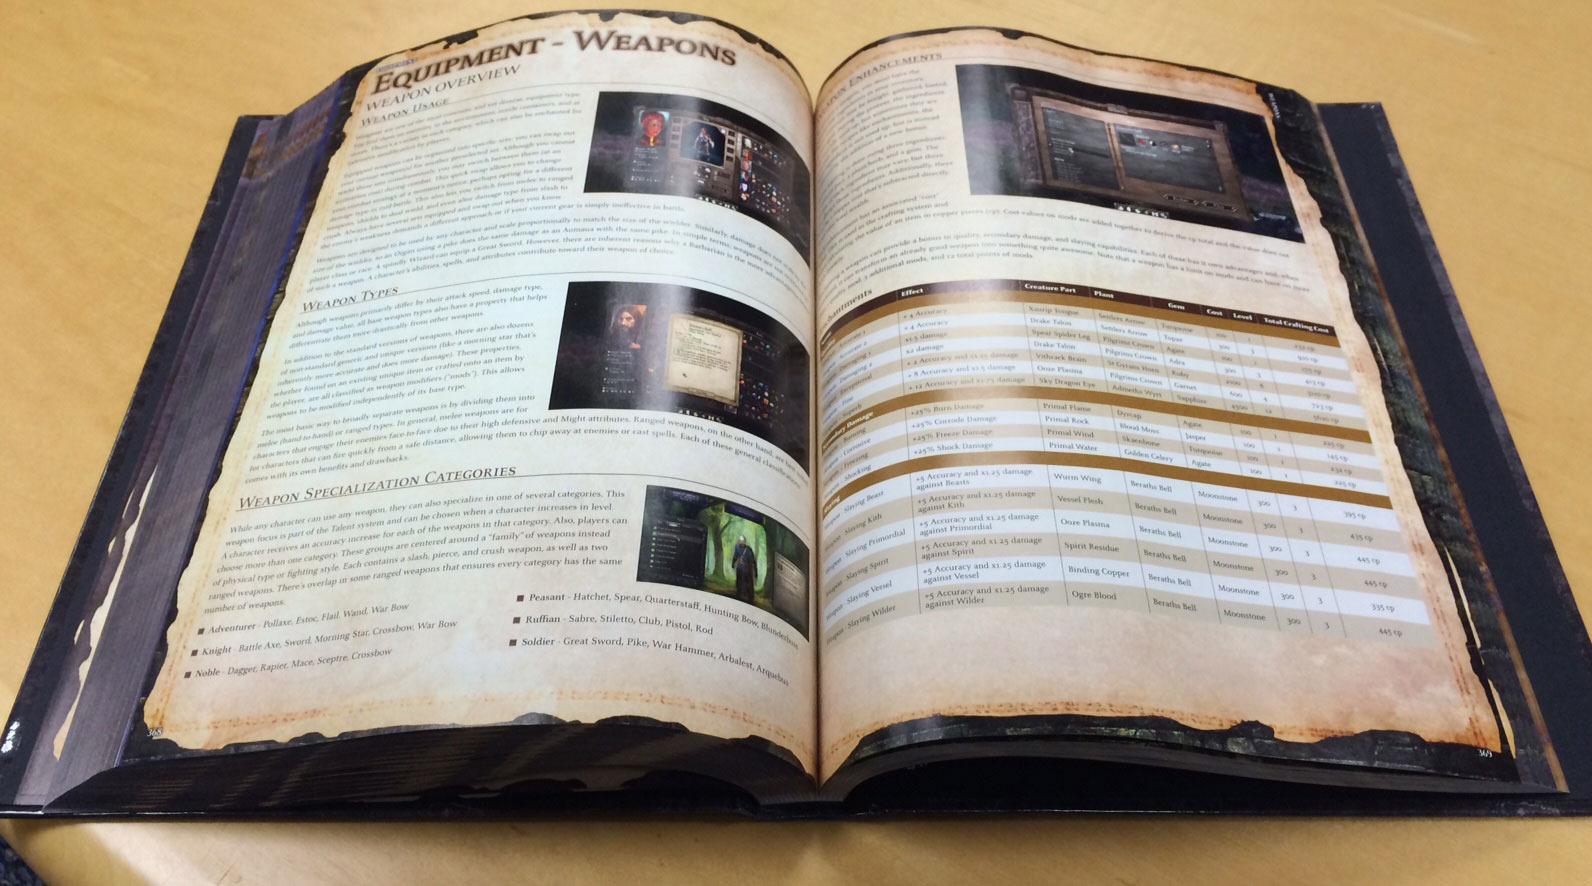 Pillars of Eternity Game Guide